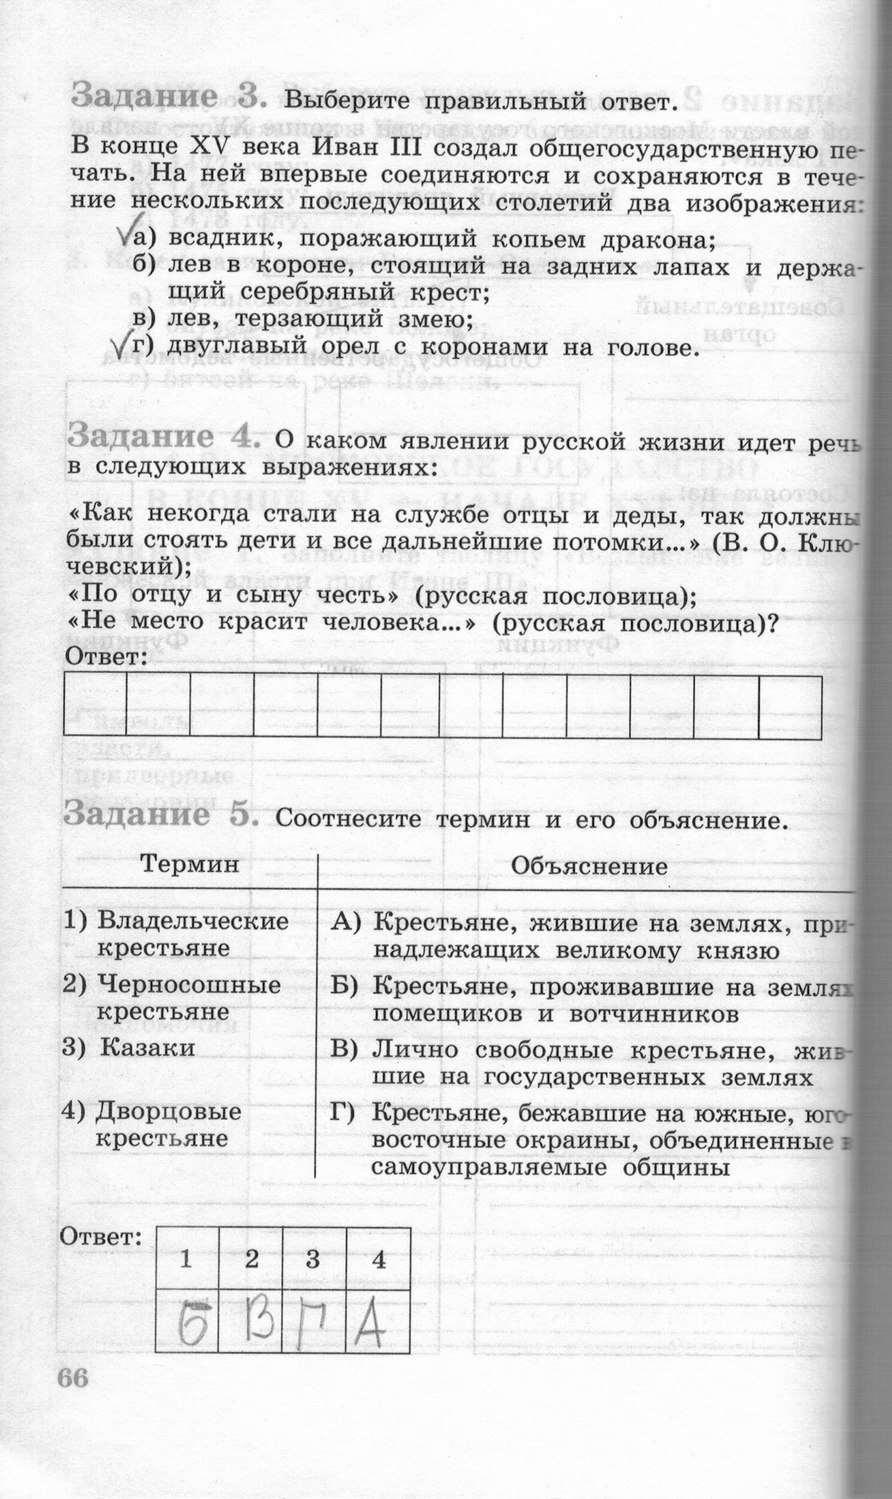 Решебник по учебнику истории 6 класс данилов